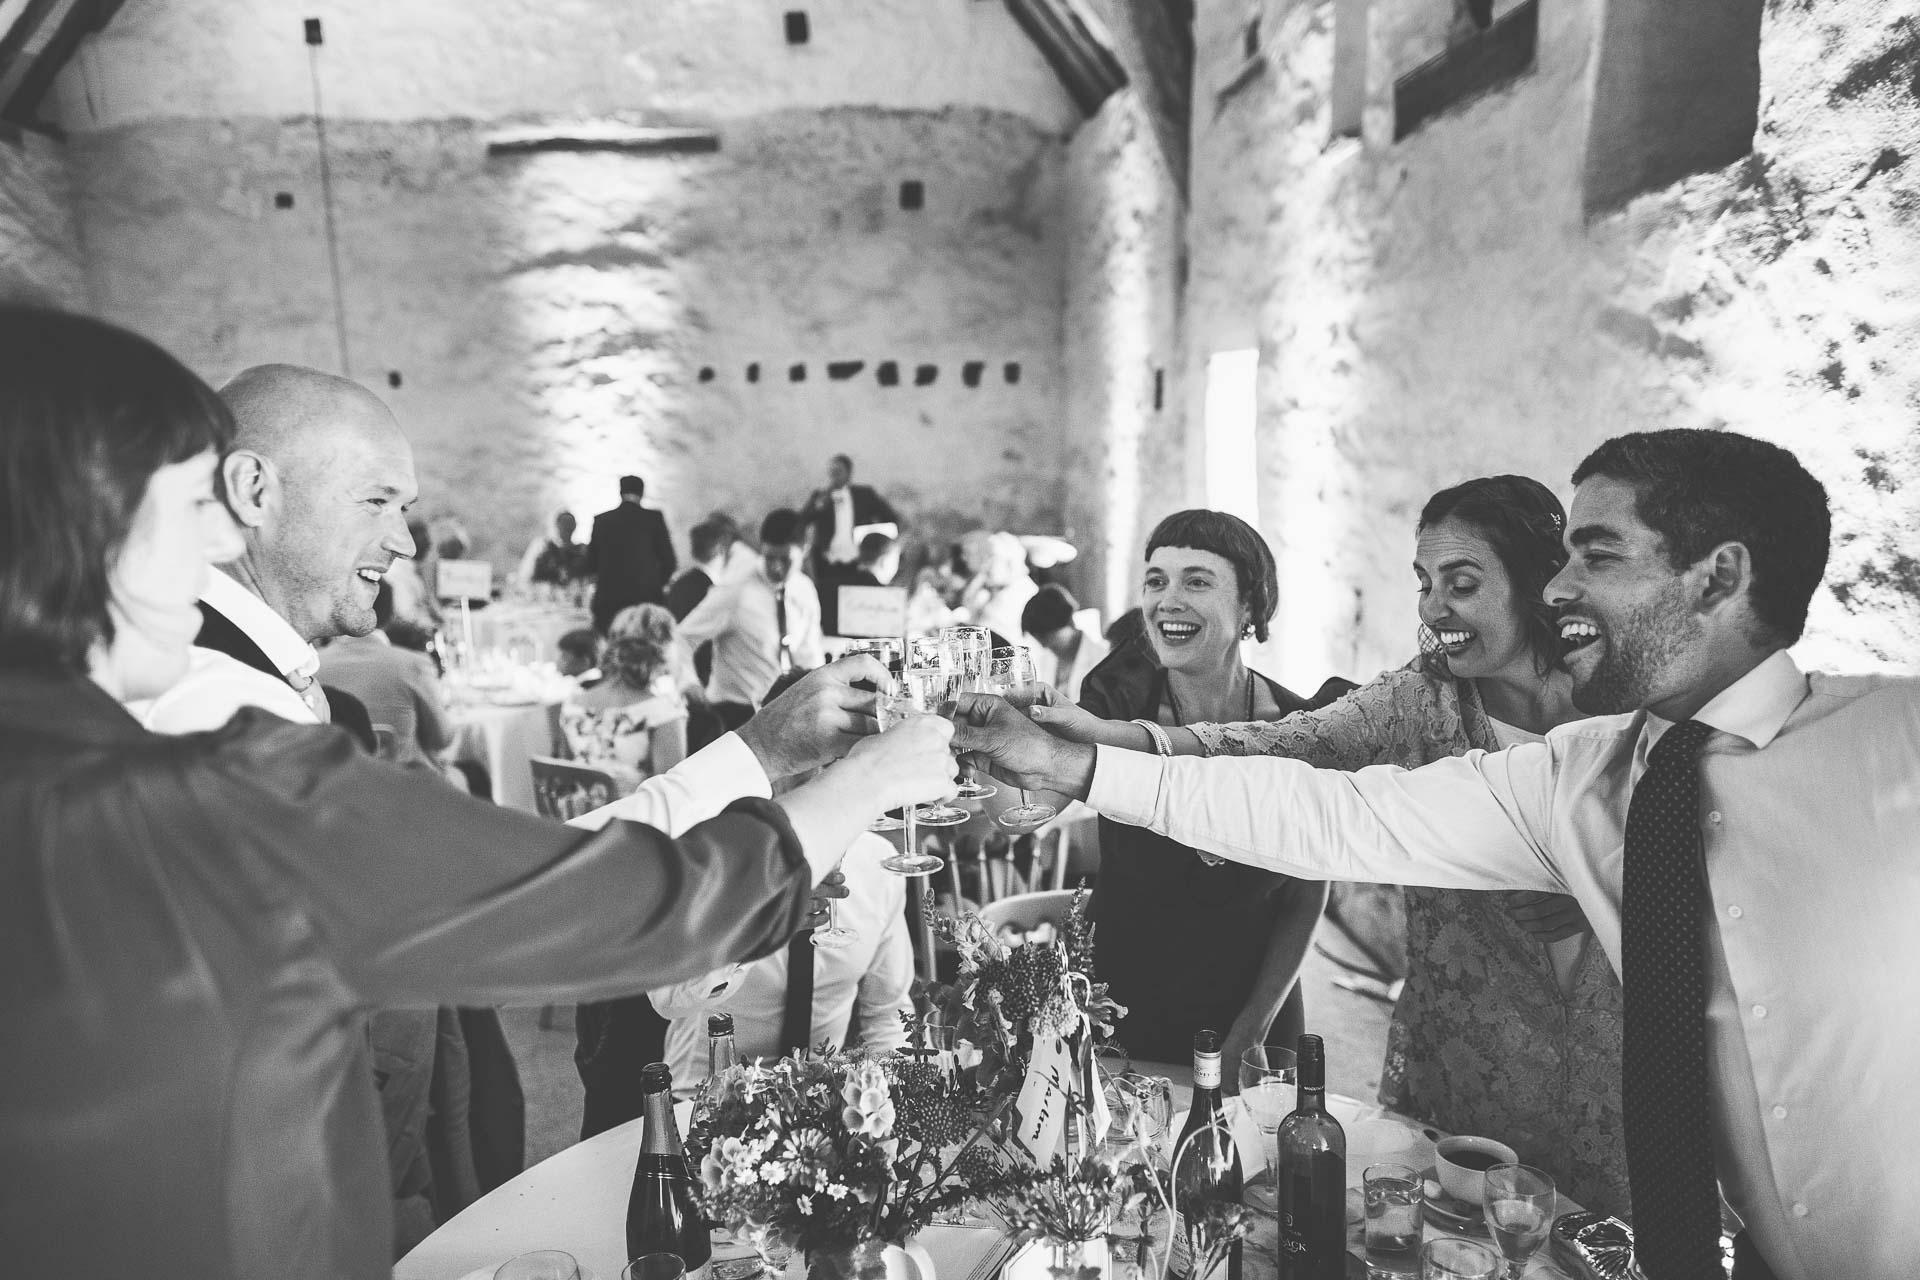 winterbourne-medieval-barn-wedding-photography-emma-andrew-95